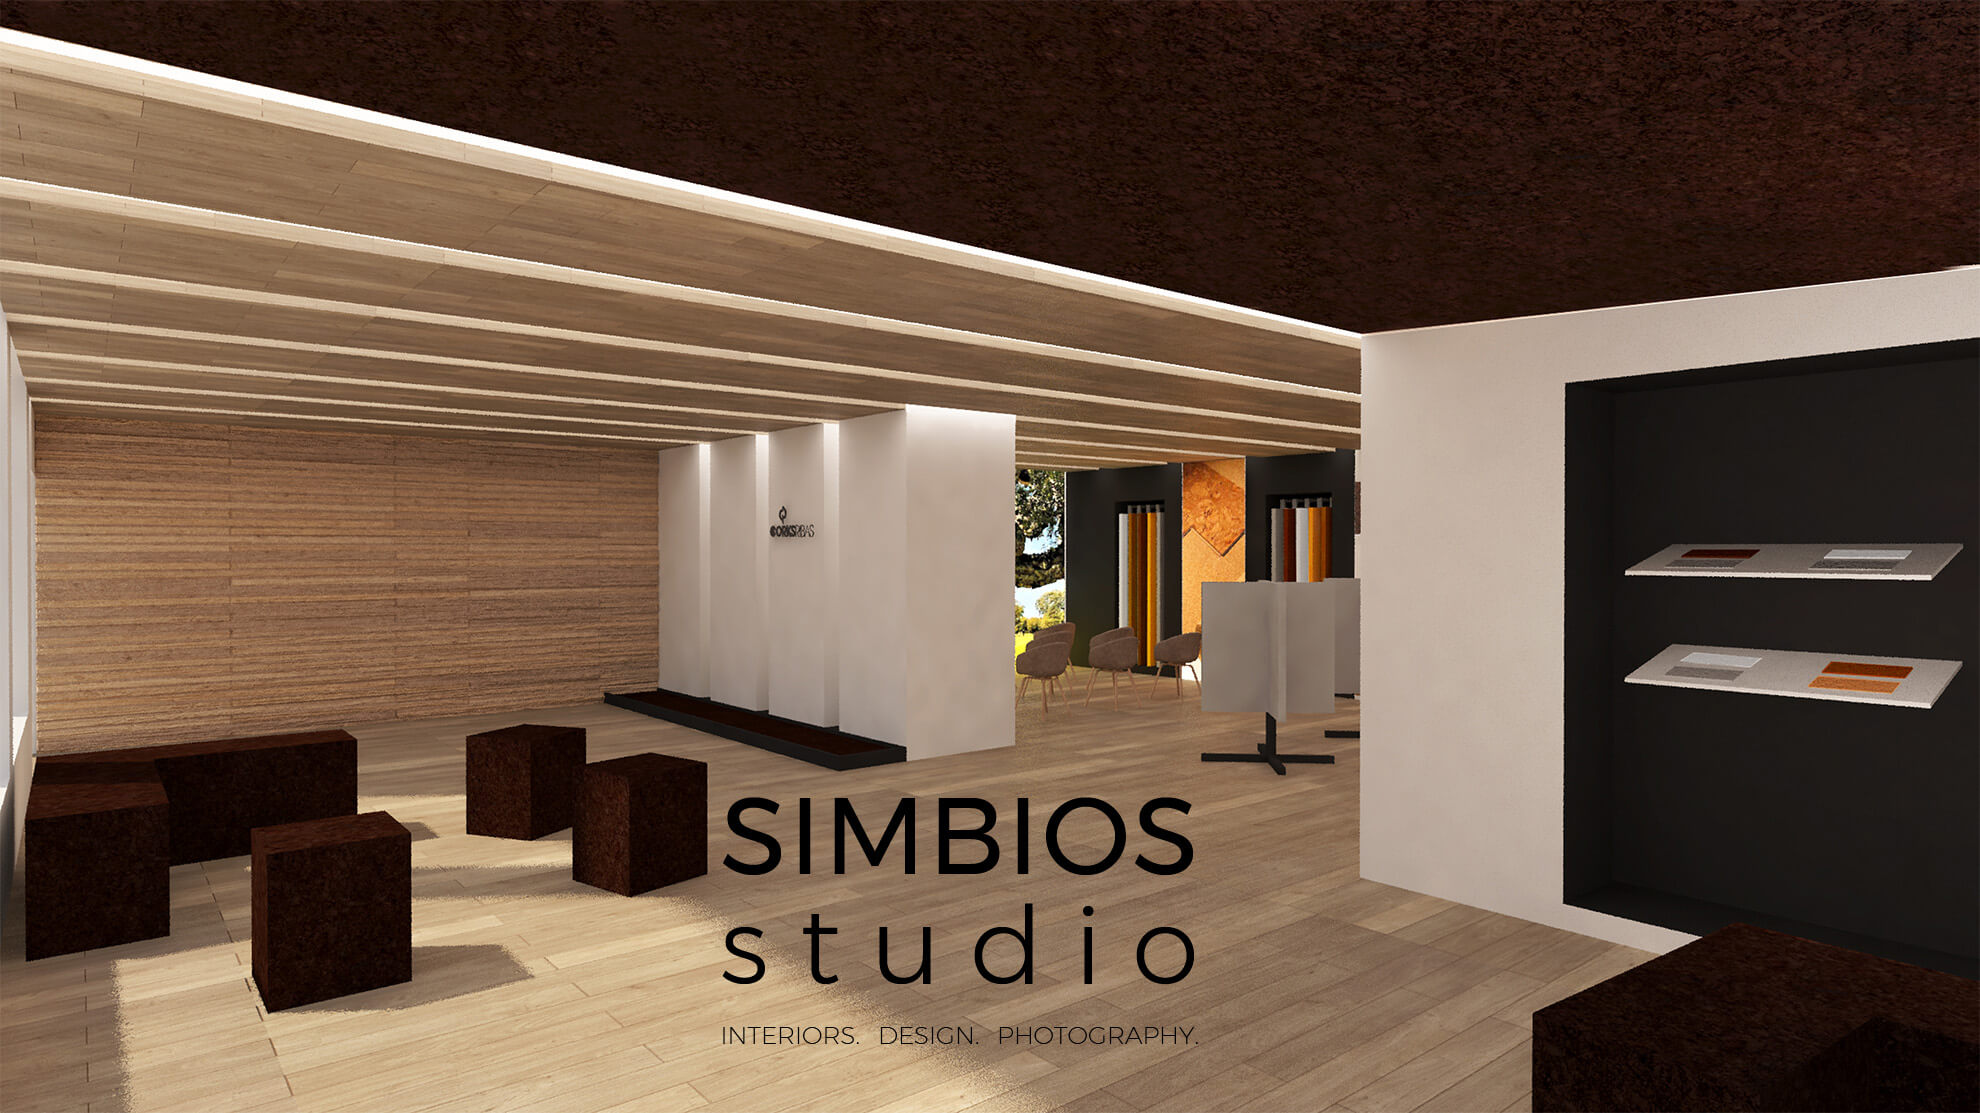 SIMBIOS studio